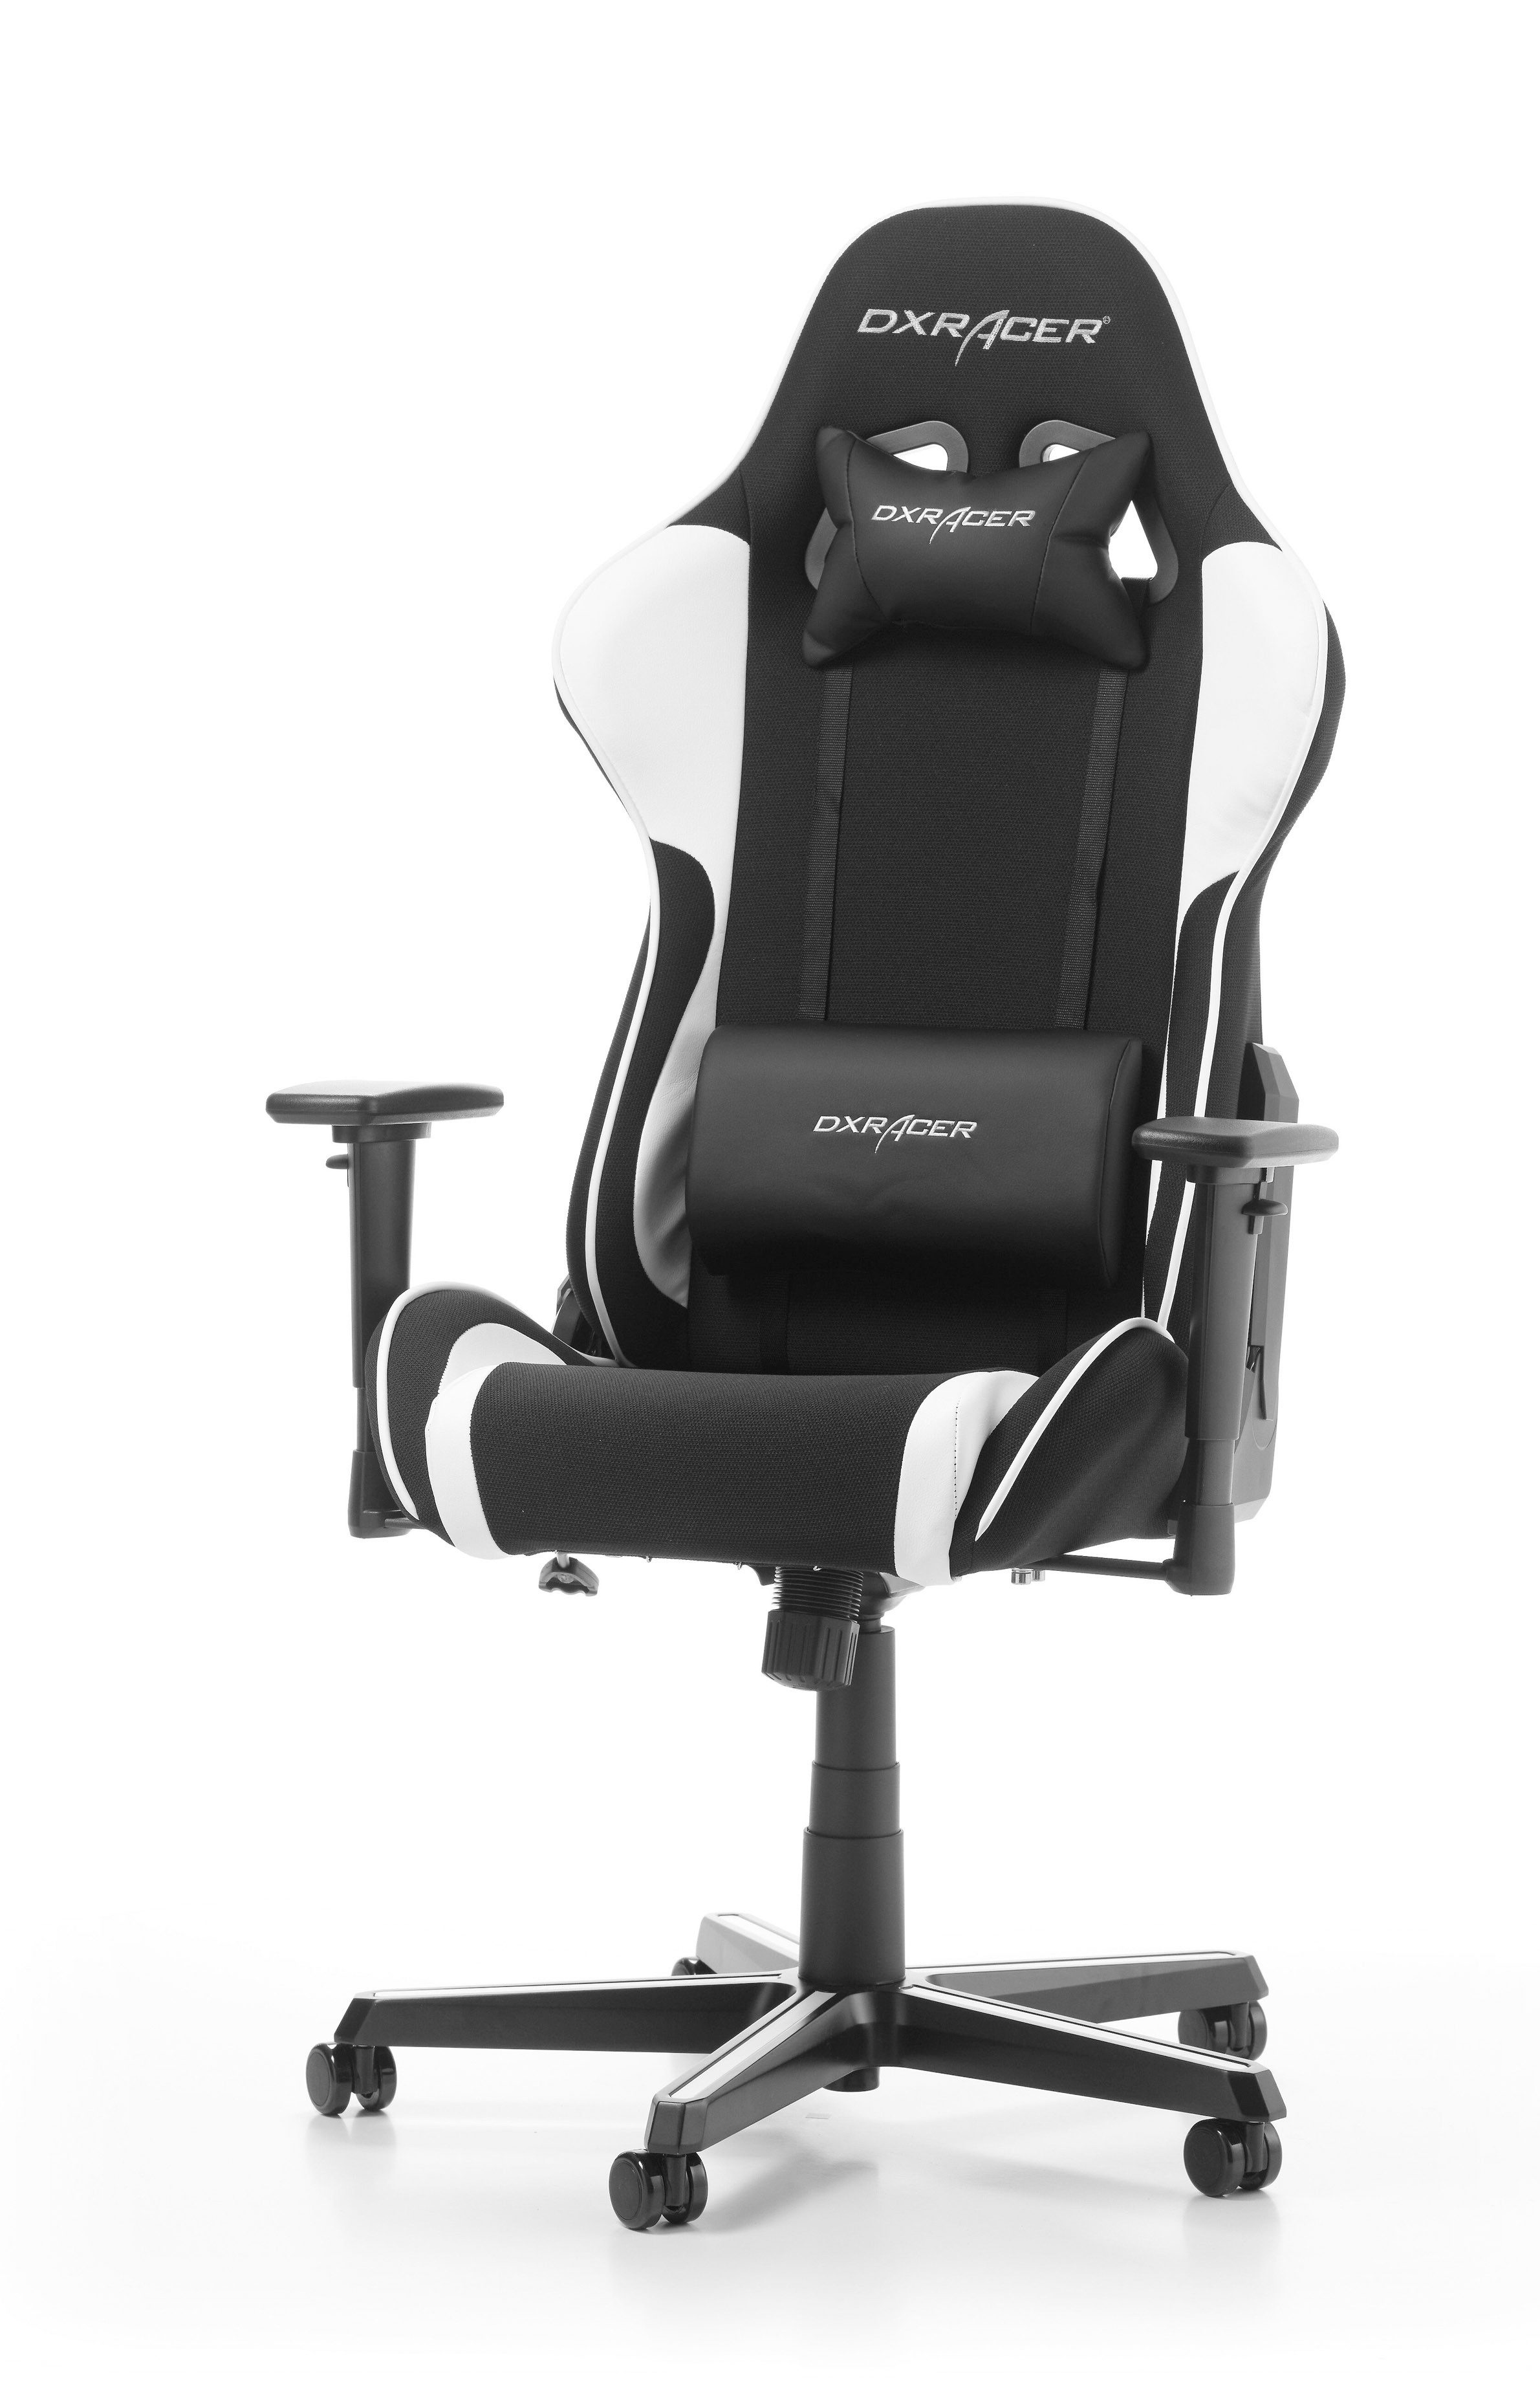 DXRACER FORMULA SERIES F11-NW balta ergonominė kėdė (medžiaga+PU)